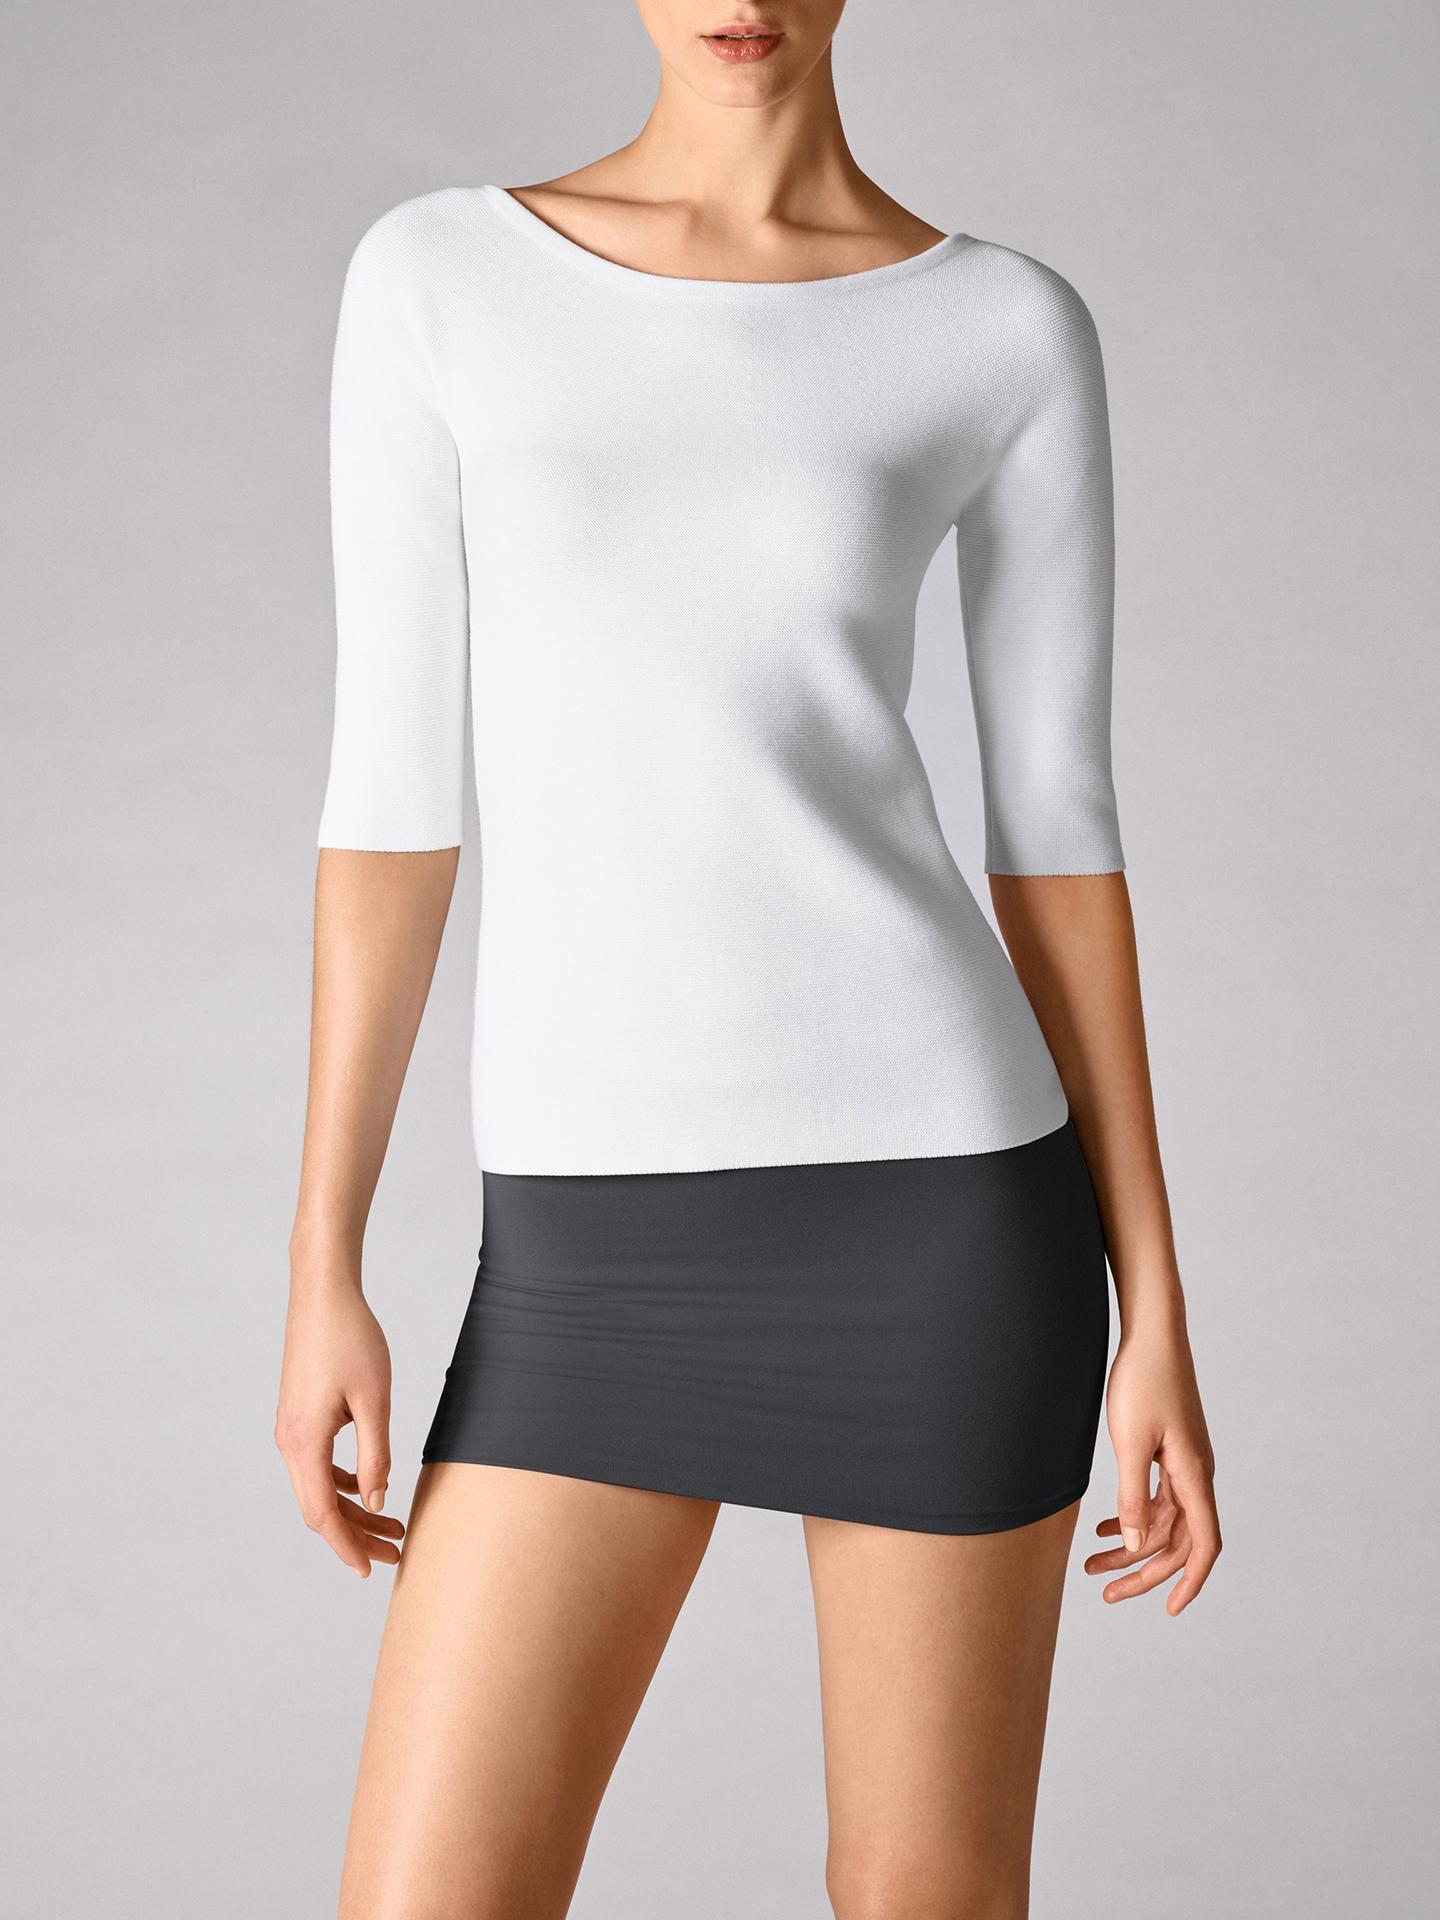 Wolford Apparel & Accessories > Clothing > Abbigliamento Donna Viscool Shirt